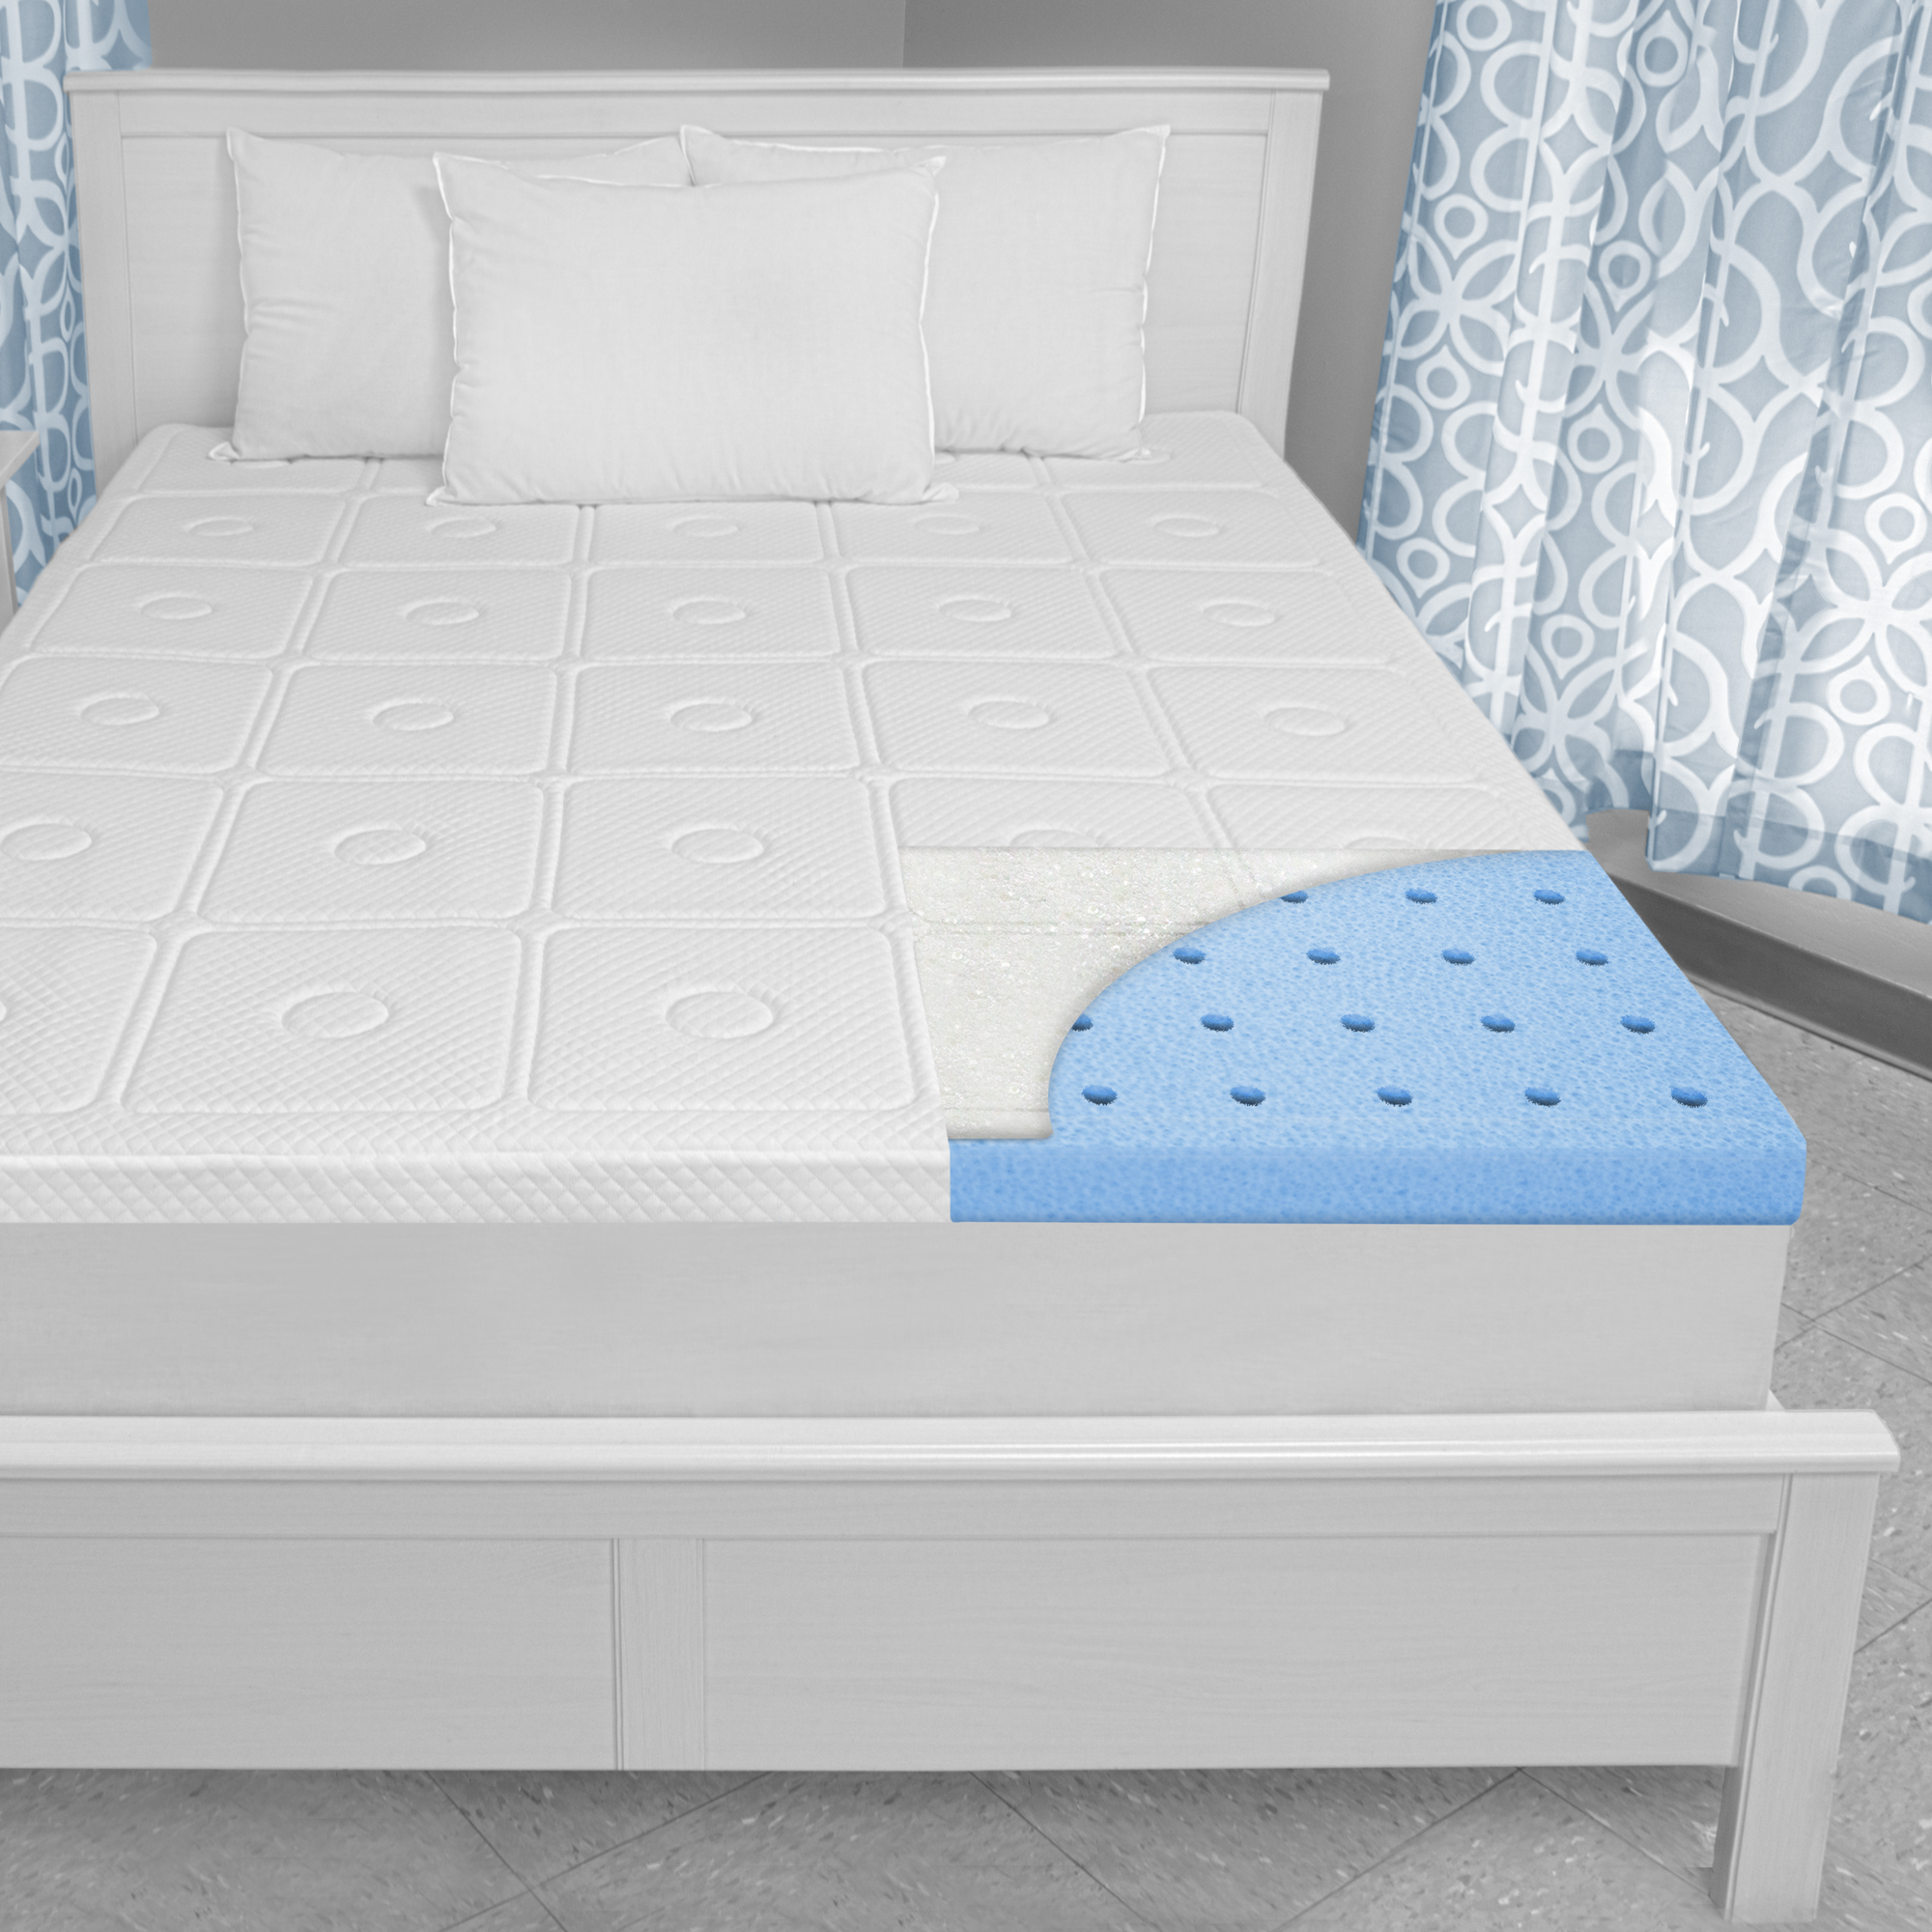 "BioPEDIC Extreme Luxury 3"" Memory Foam Twin Mattress Topper"